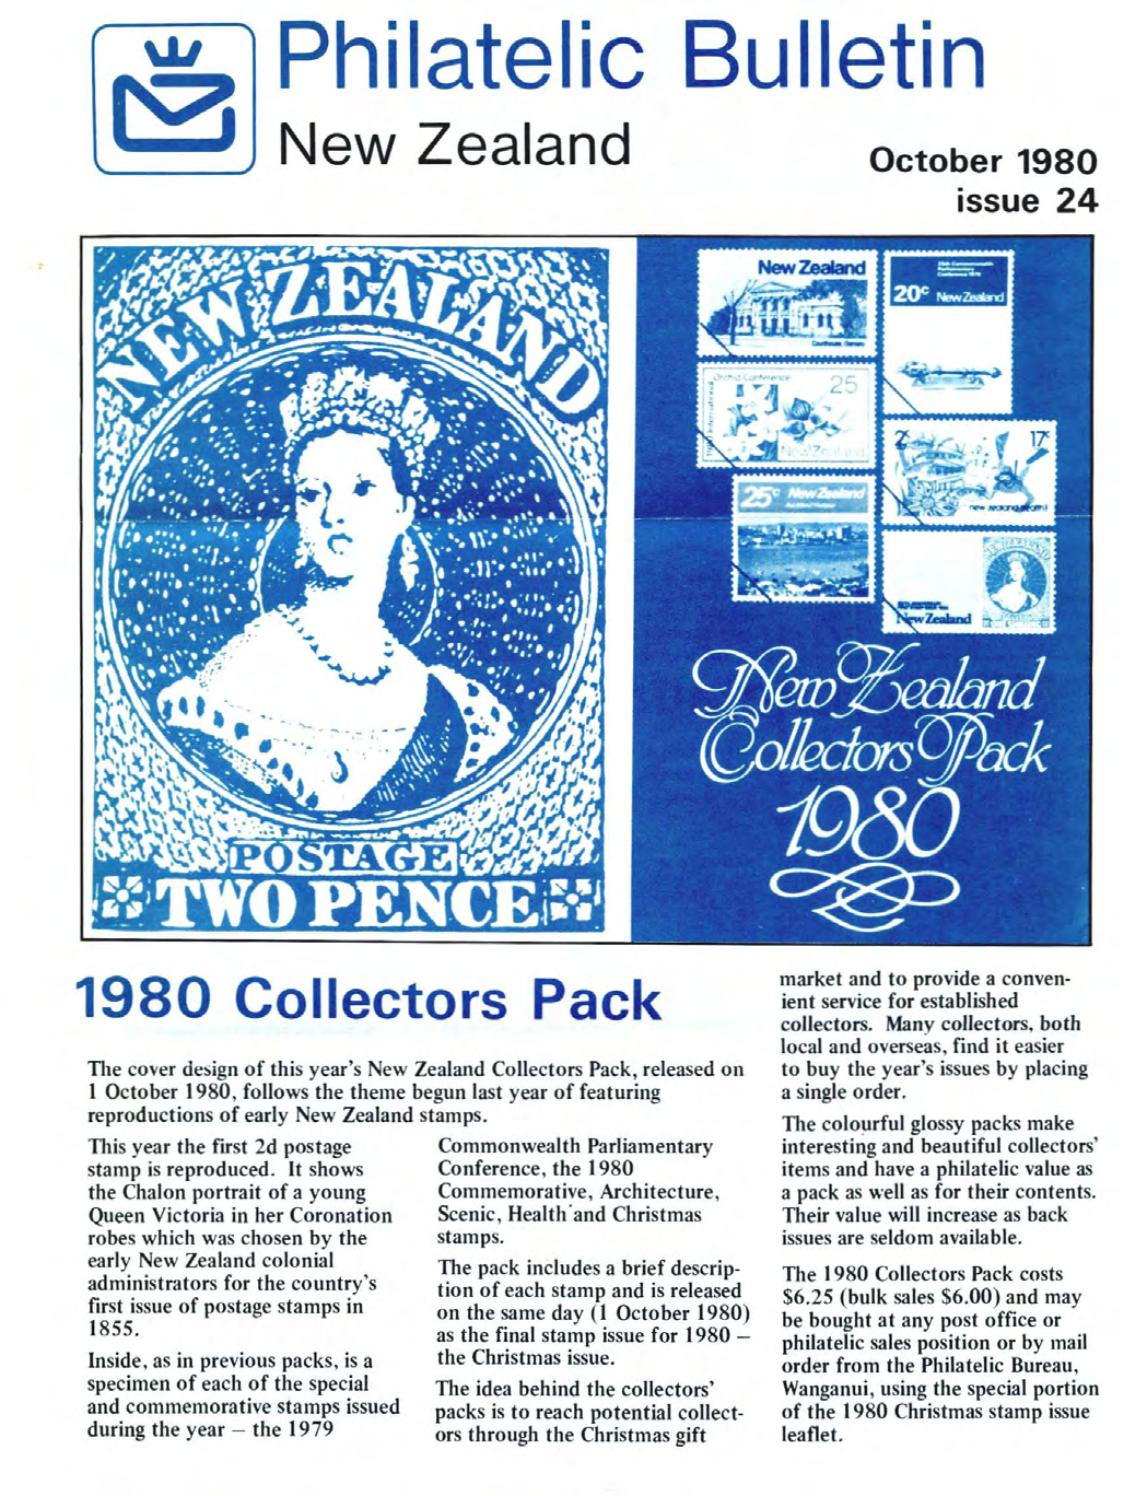 Series 4 new zealand philatelic bulletin no 24 1980 october by New Zealand Post - Issuu